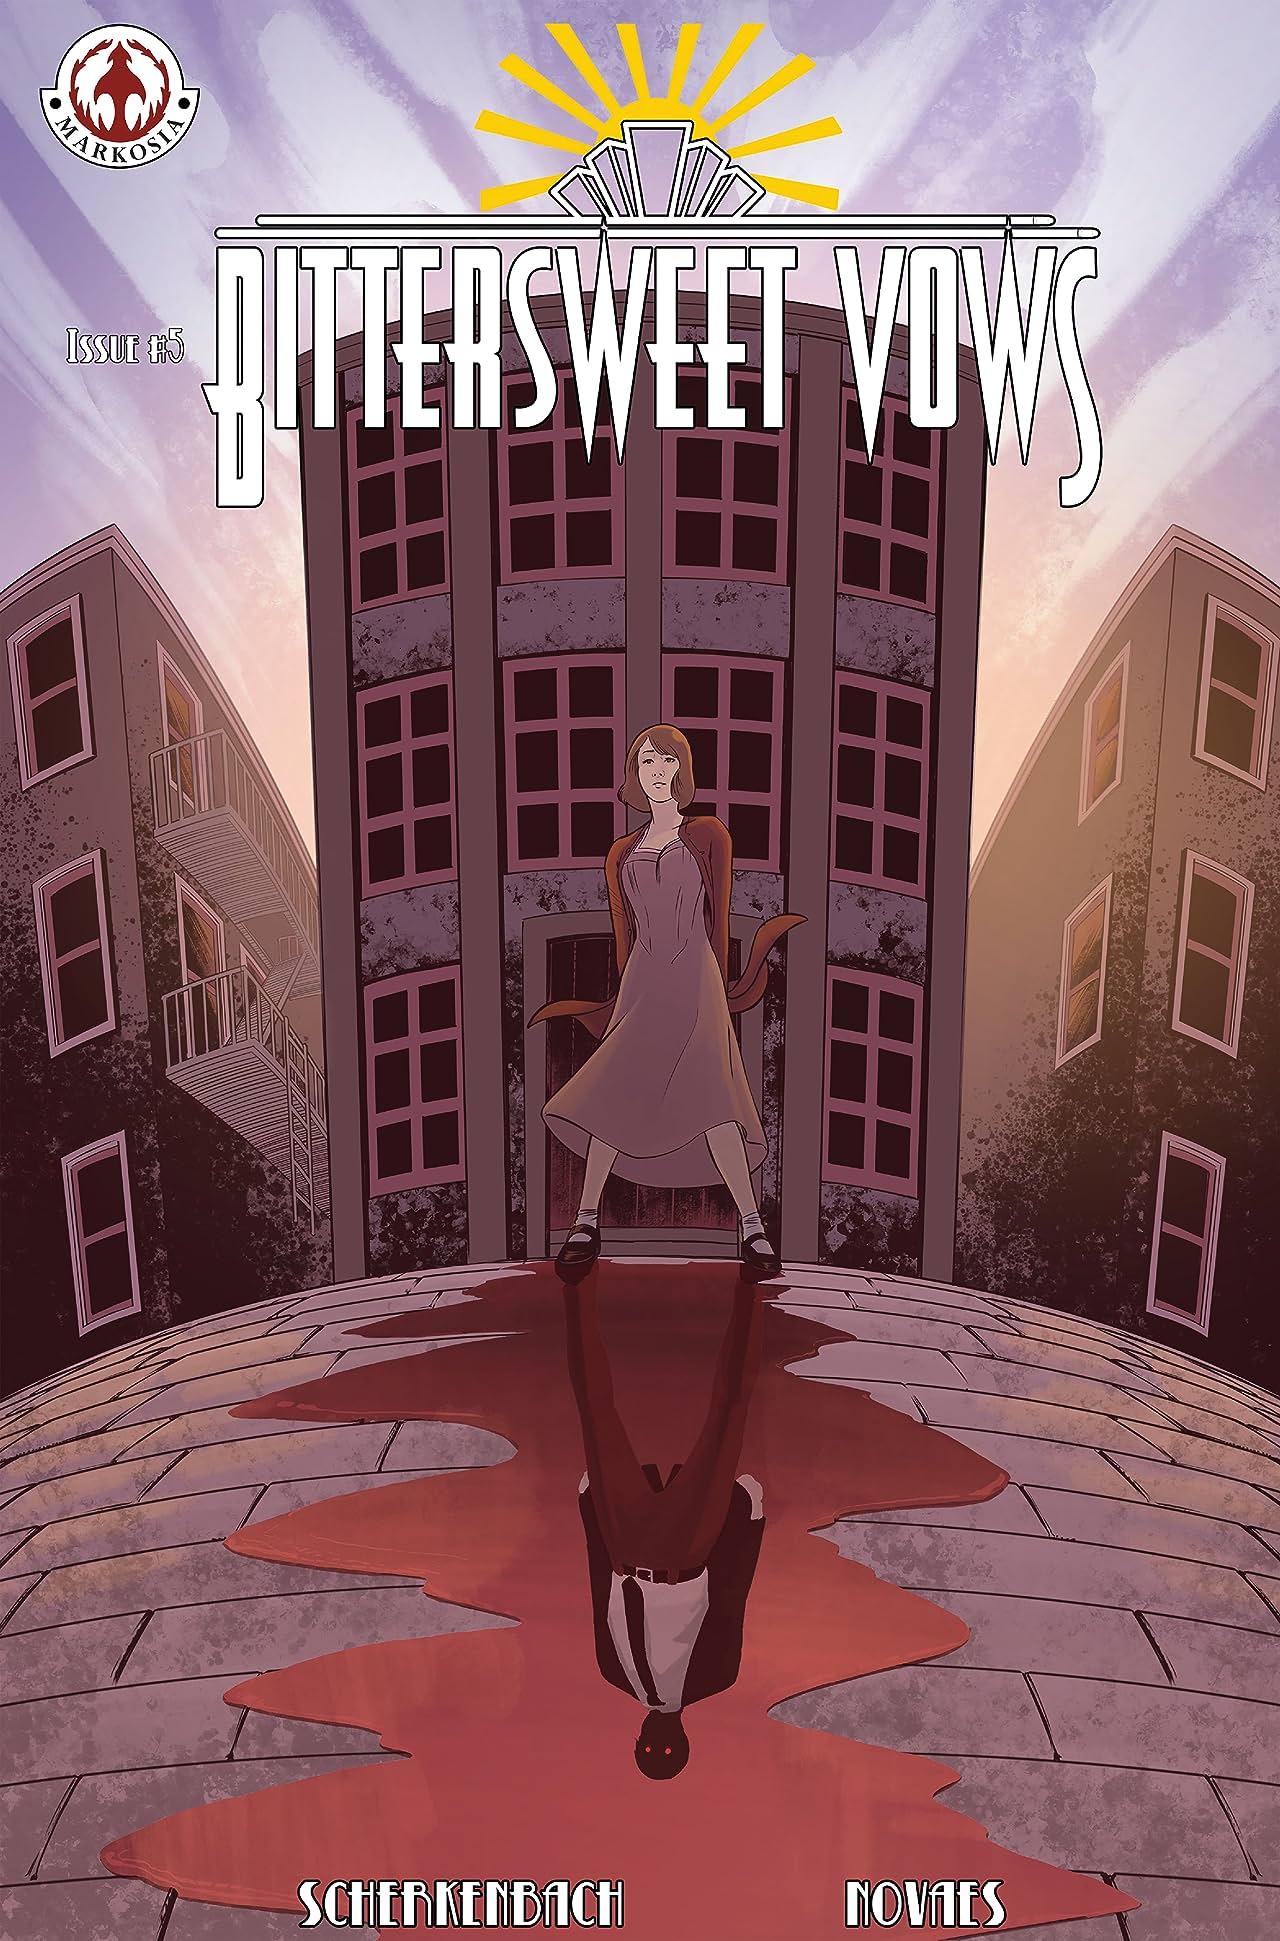 Bittersweet Vows #5